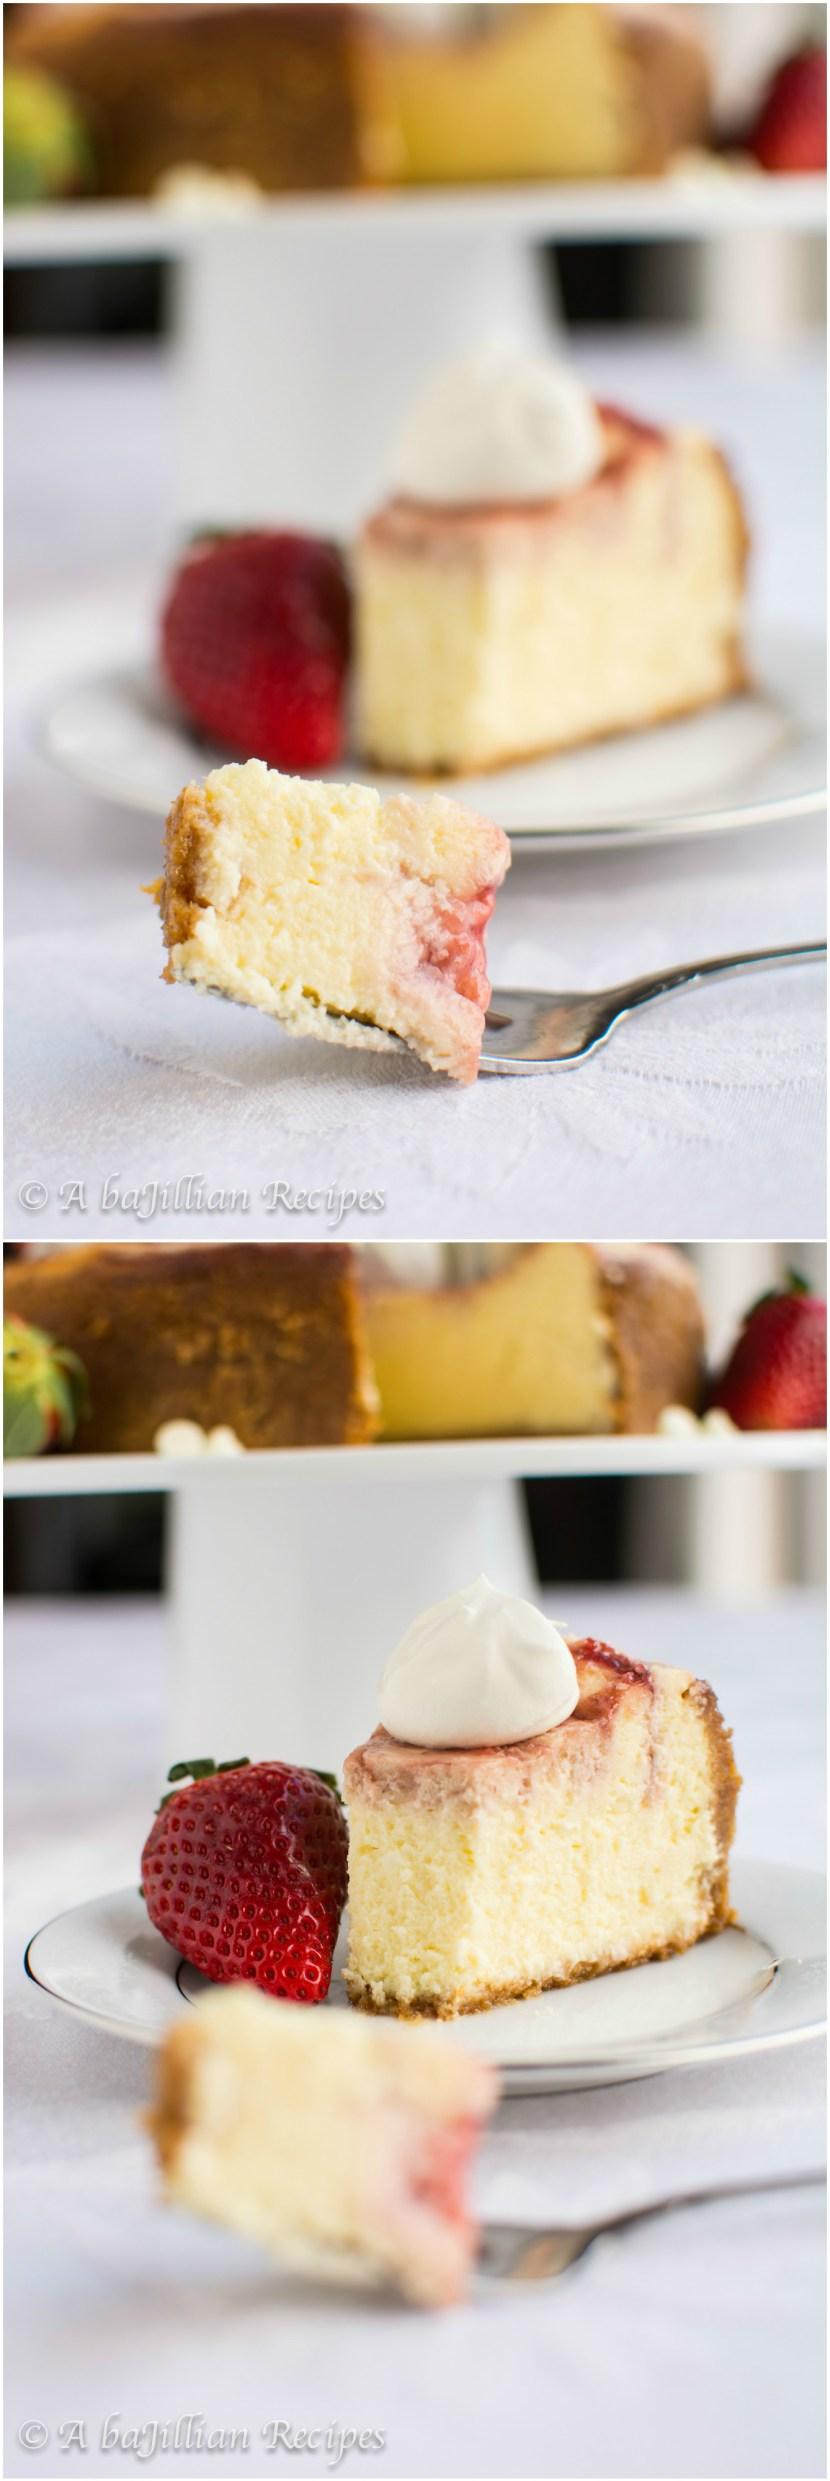 White-Chocolate-Strawberry-Cheesecake-abajillianrecipes.com2